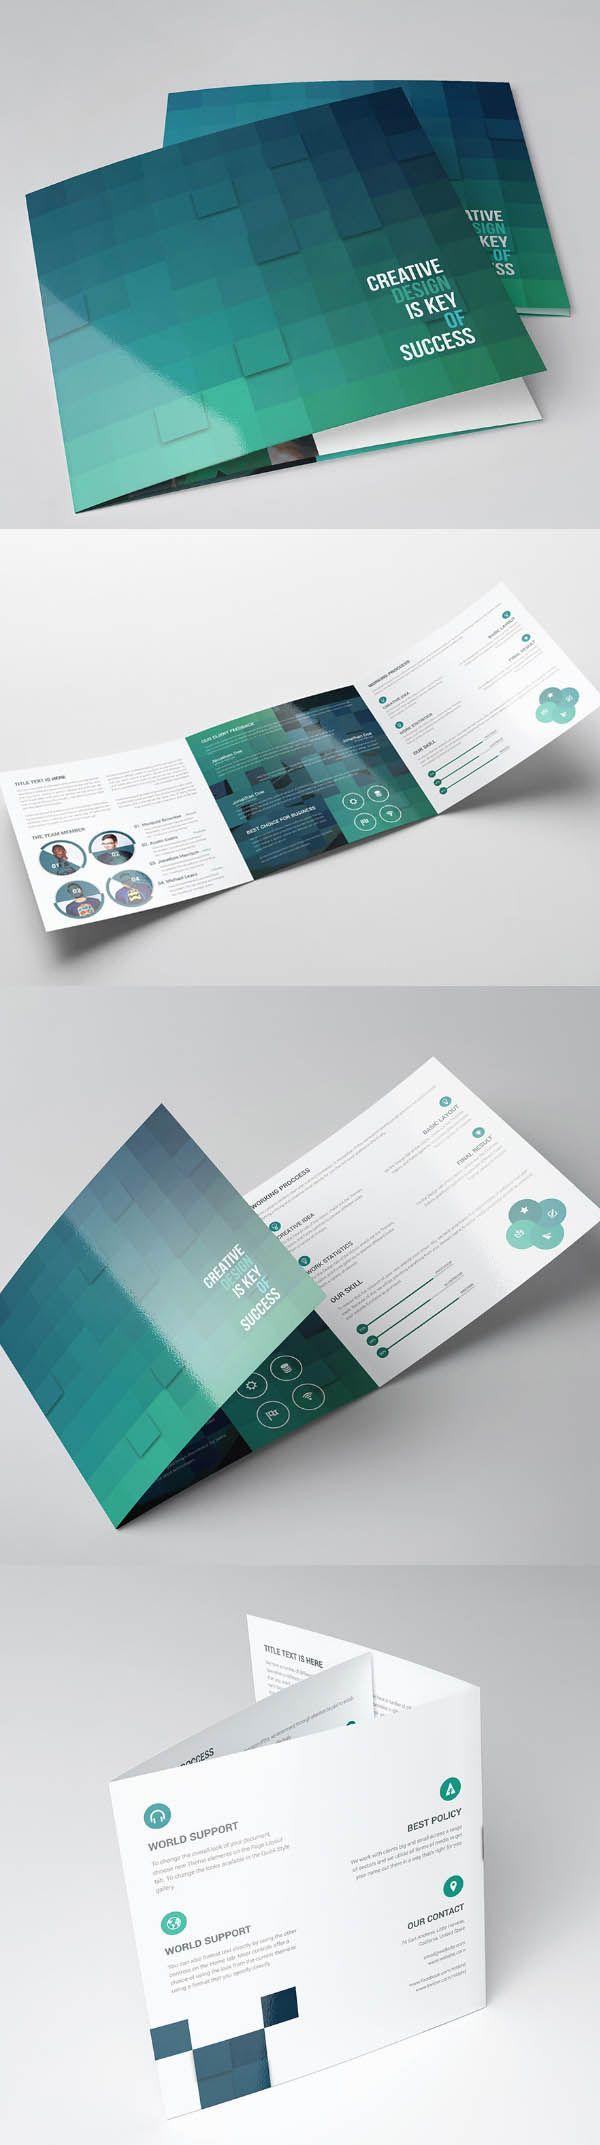 tri fold brochure dimensions